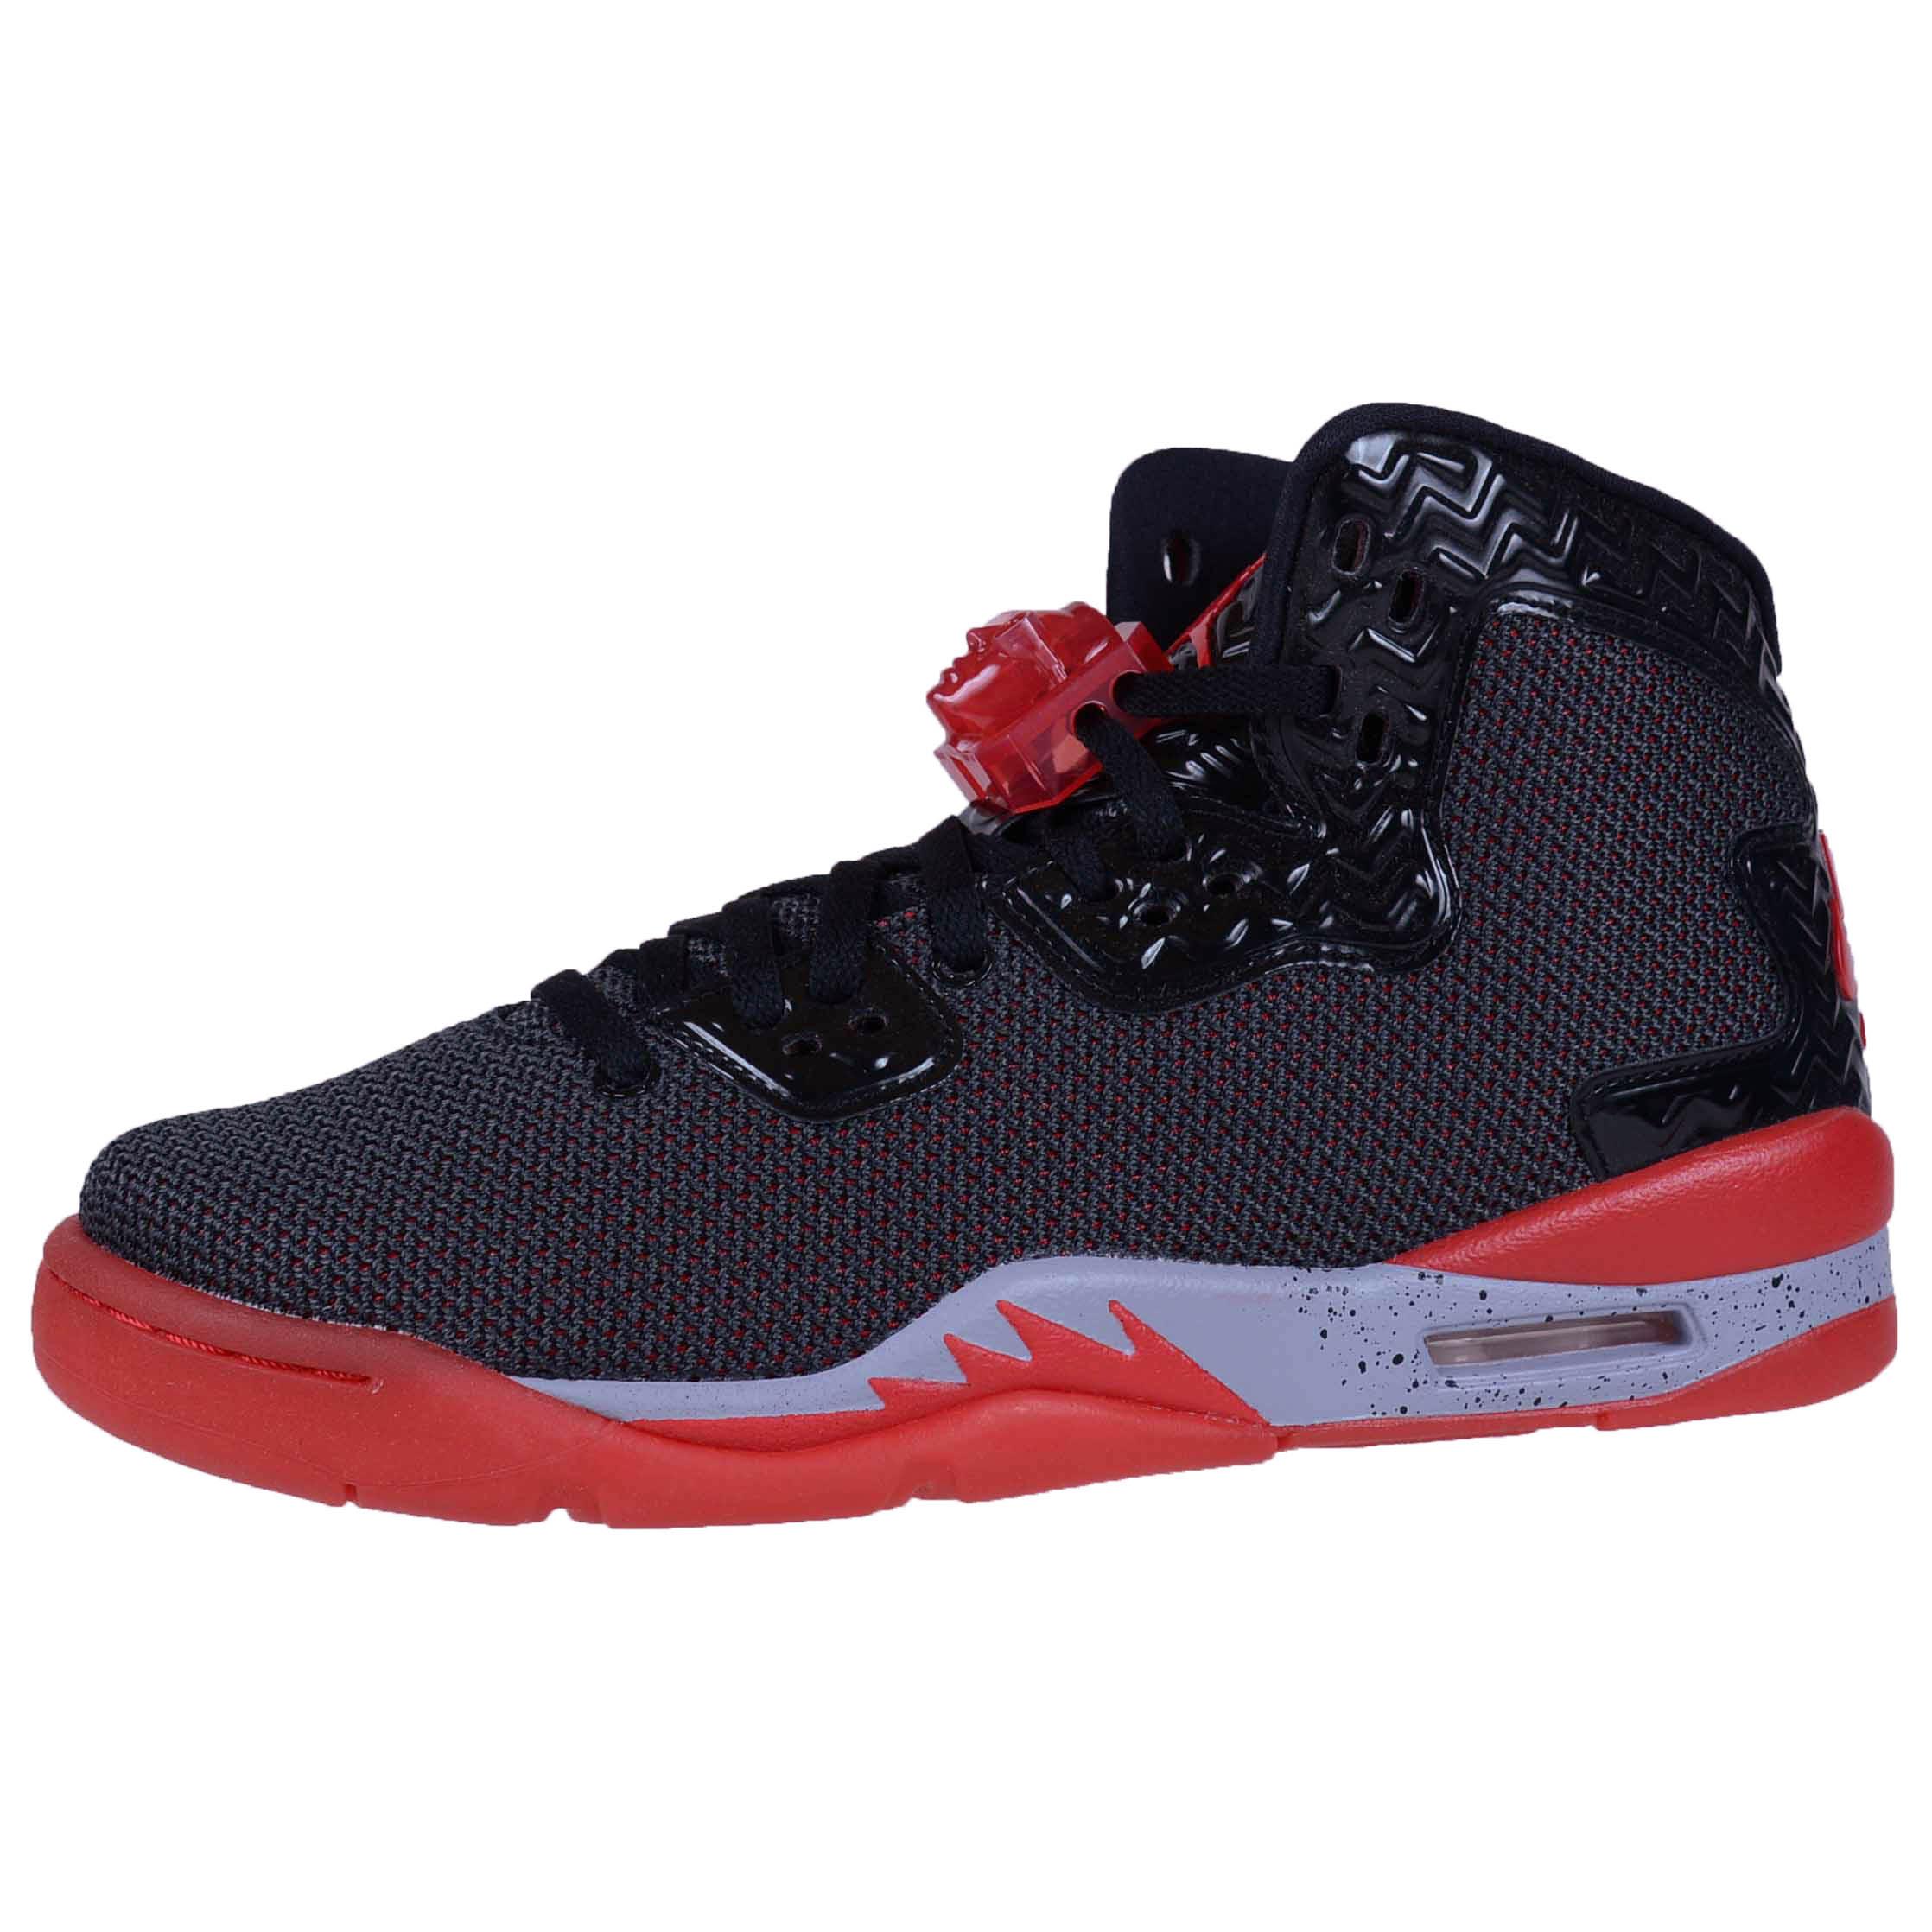 NIKE BOYS AIR JORDAN SPIKE FORTY BG BLACK FIRE RED CEMENT GREY 807542 002